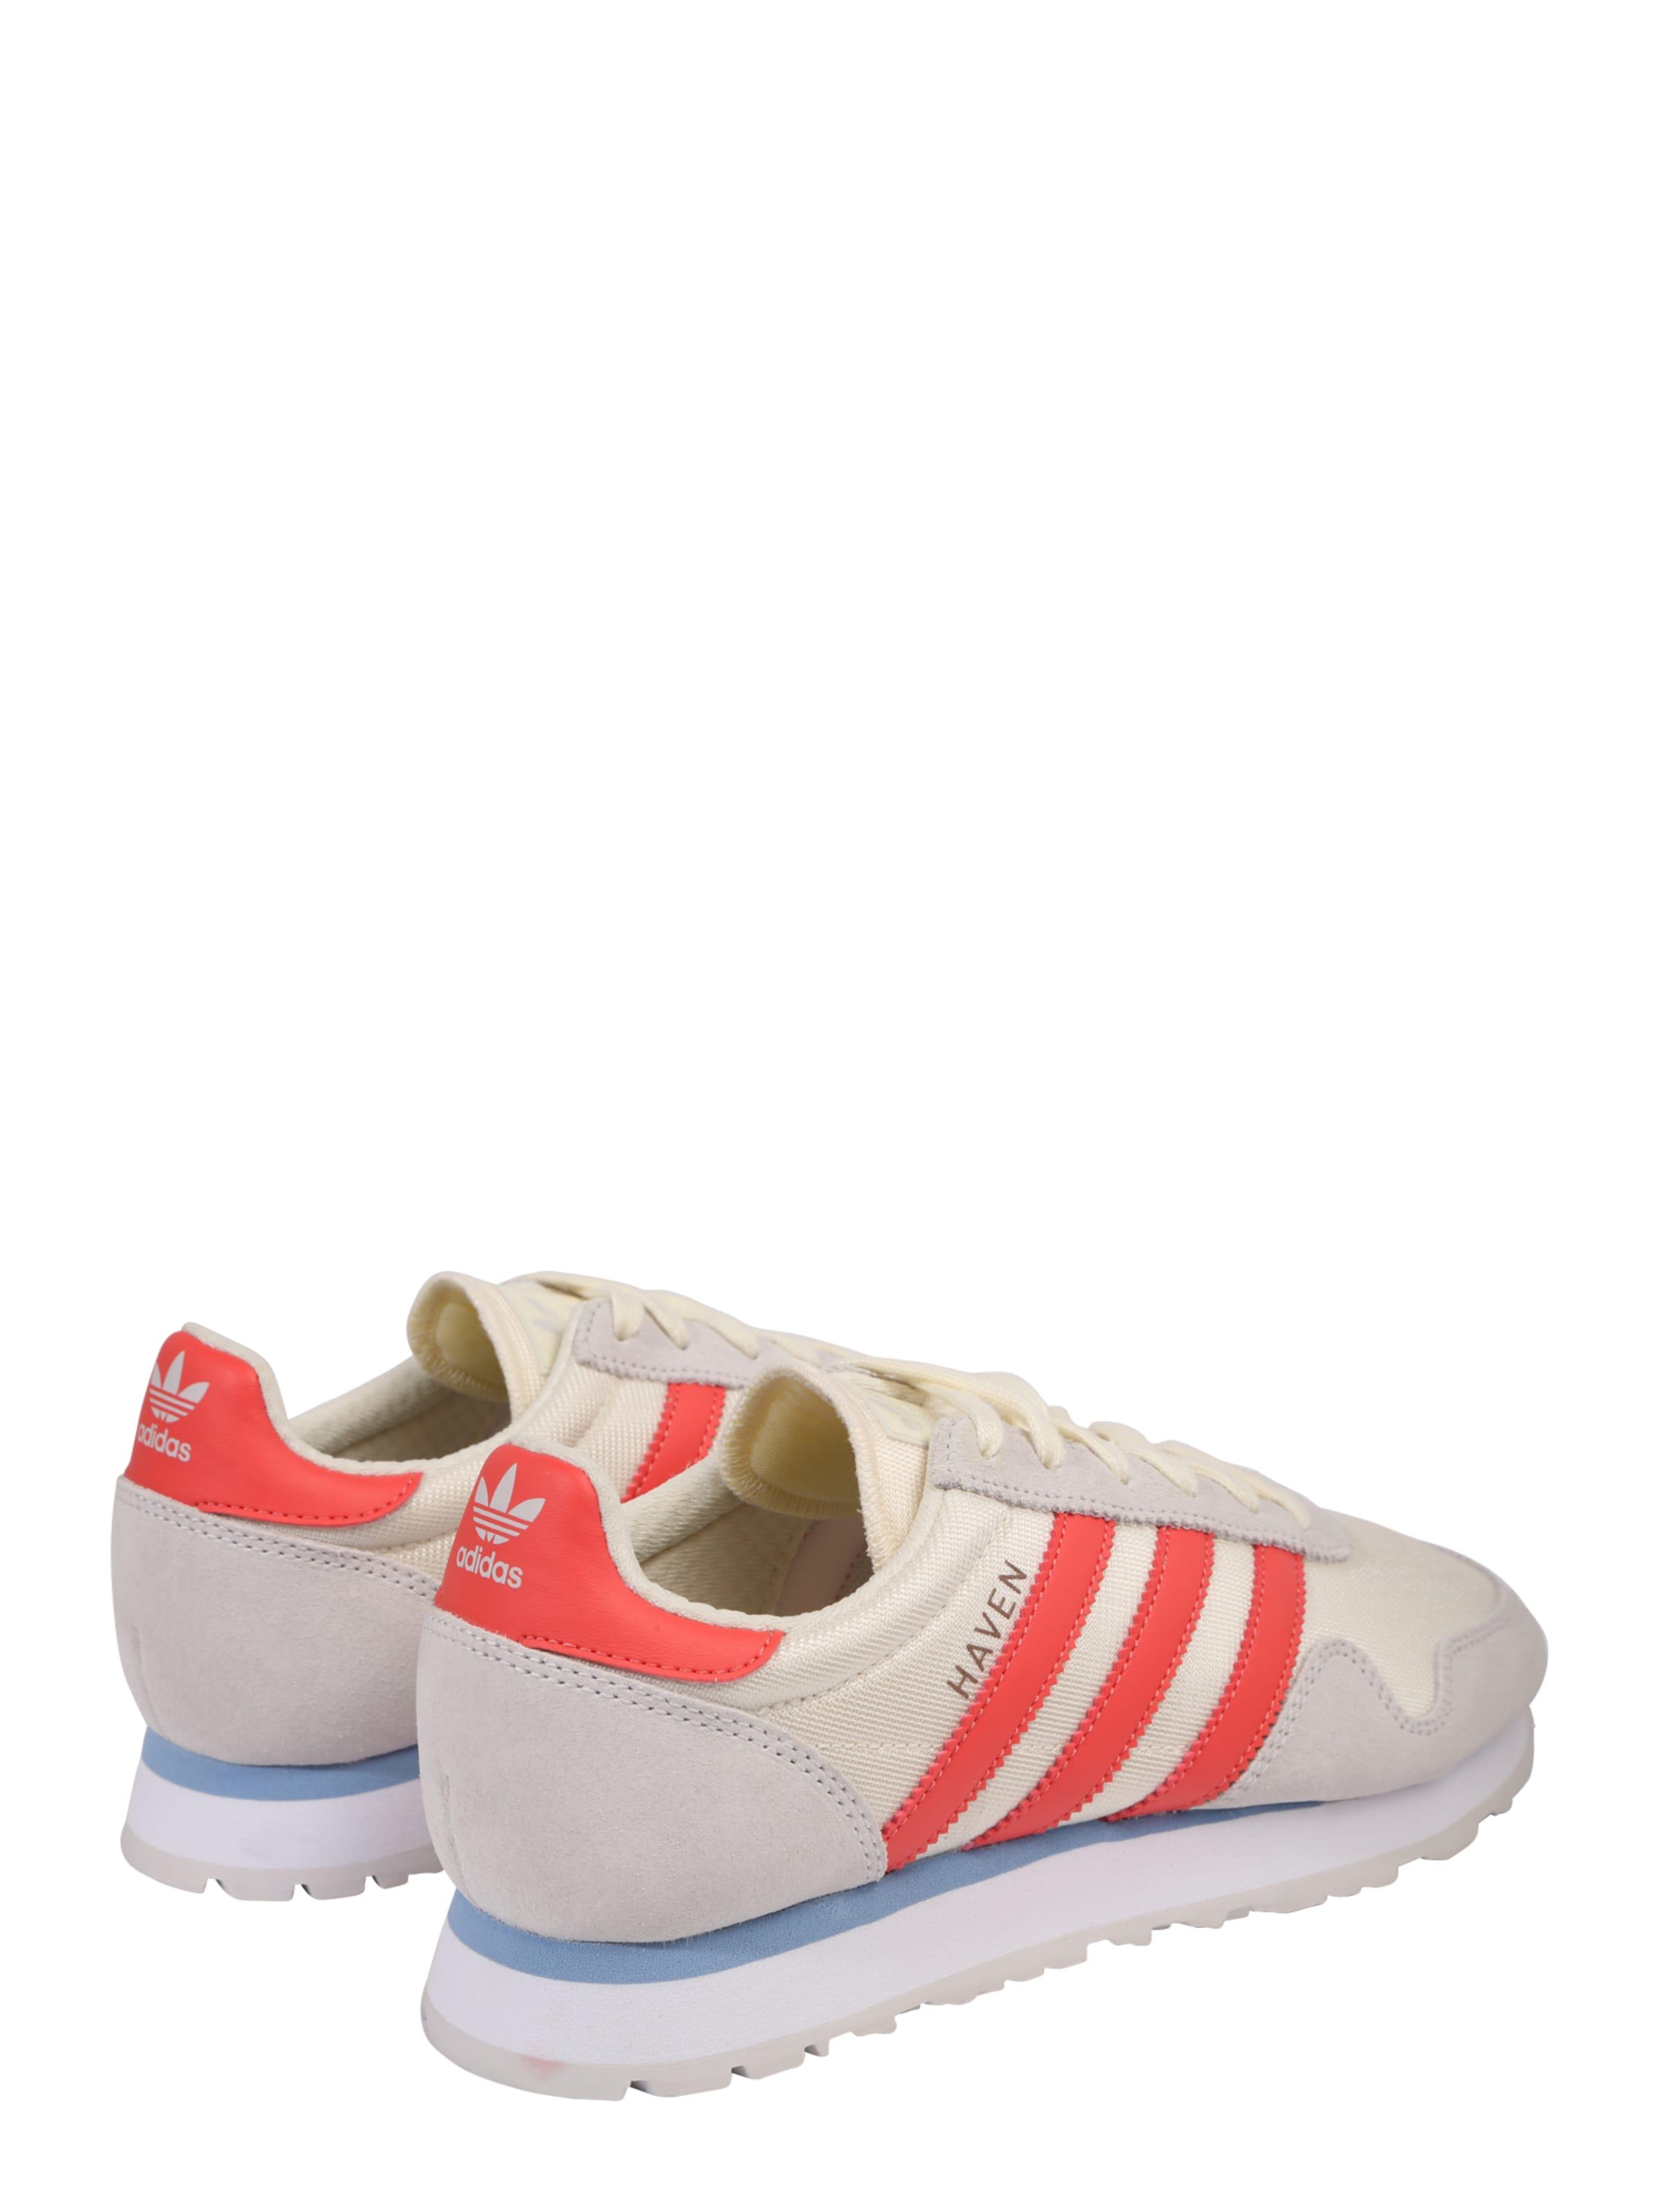 Adidas 'haven' En Basses OrangeBlanc Originals Baskets tQBCsrxdh